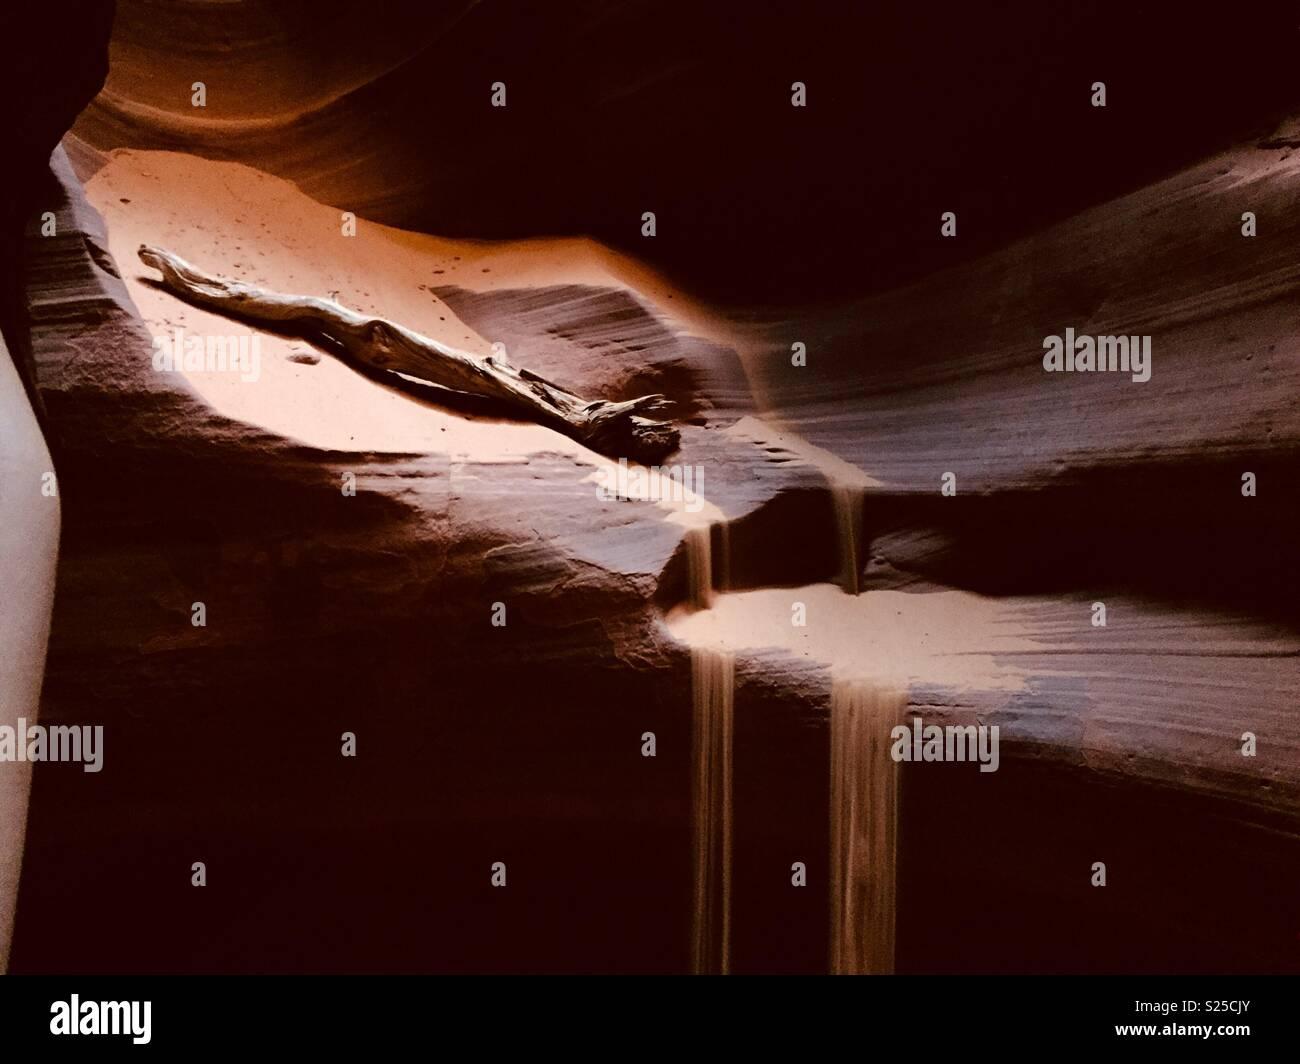 Sand waterfalls - Stock Image